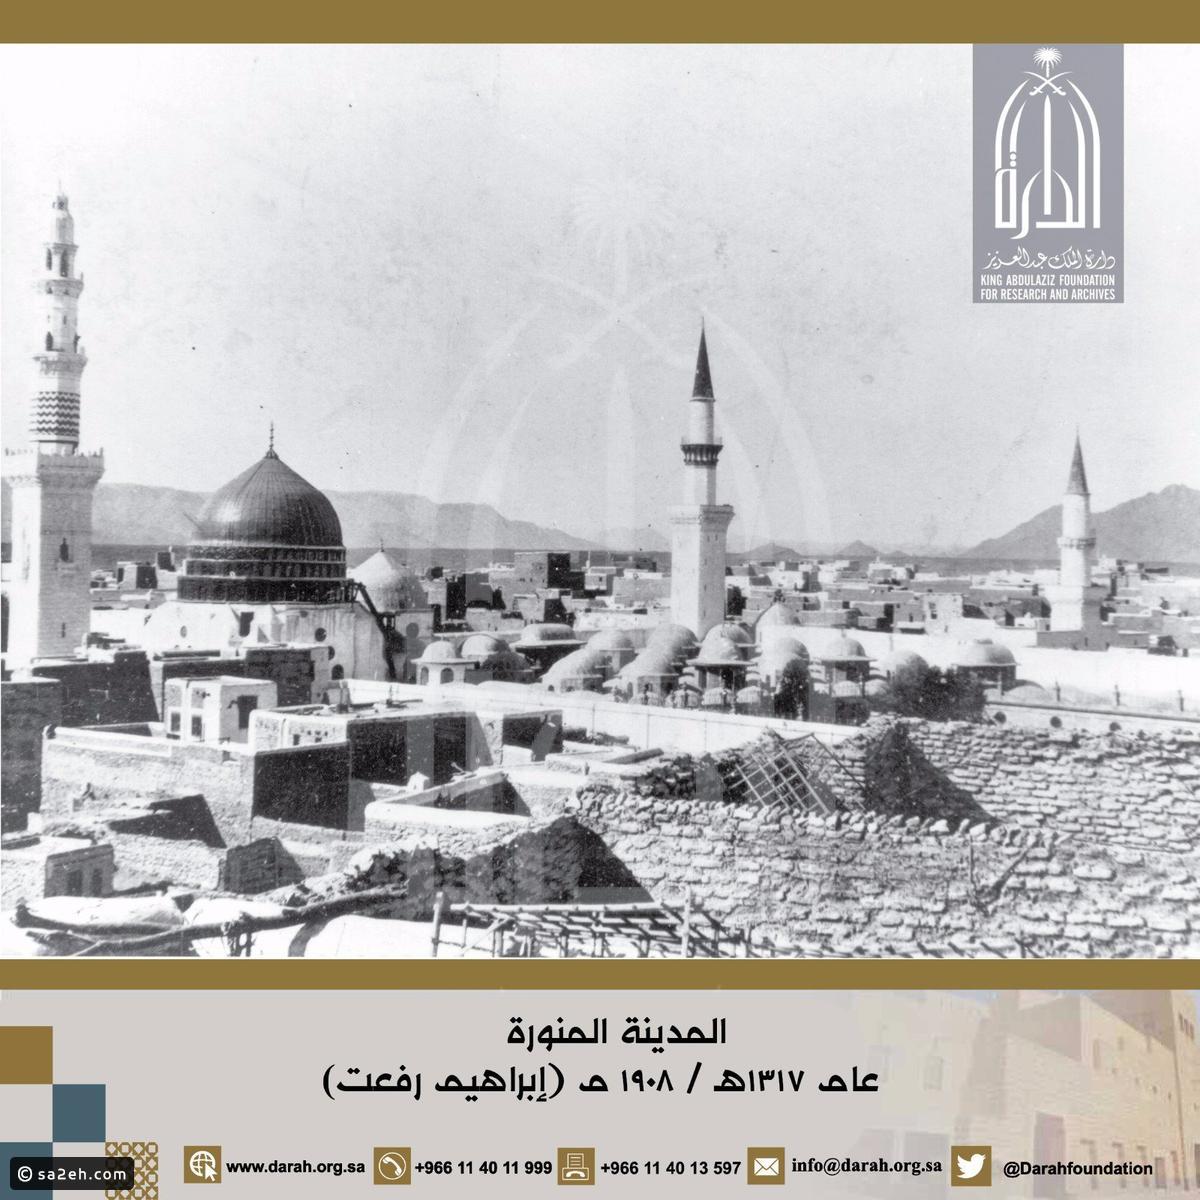 awww.alqiyady.com_site_images_sites_default_files_alqiyady_pro2f439e35c8baca8eb2292e3783599fa5.